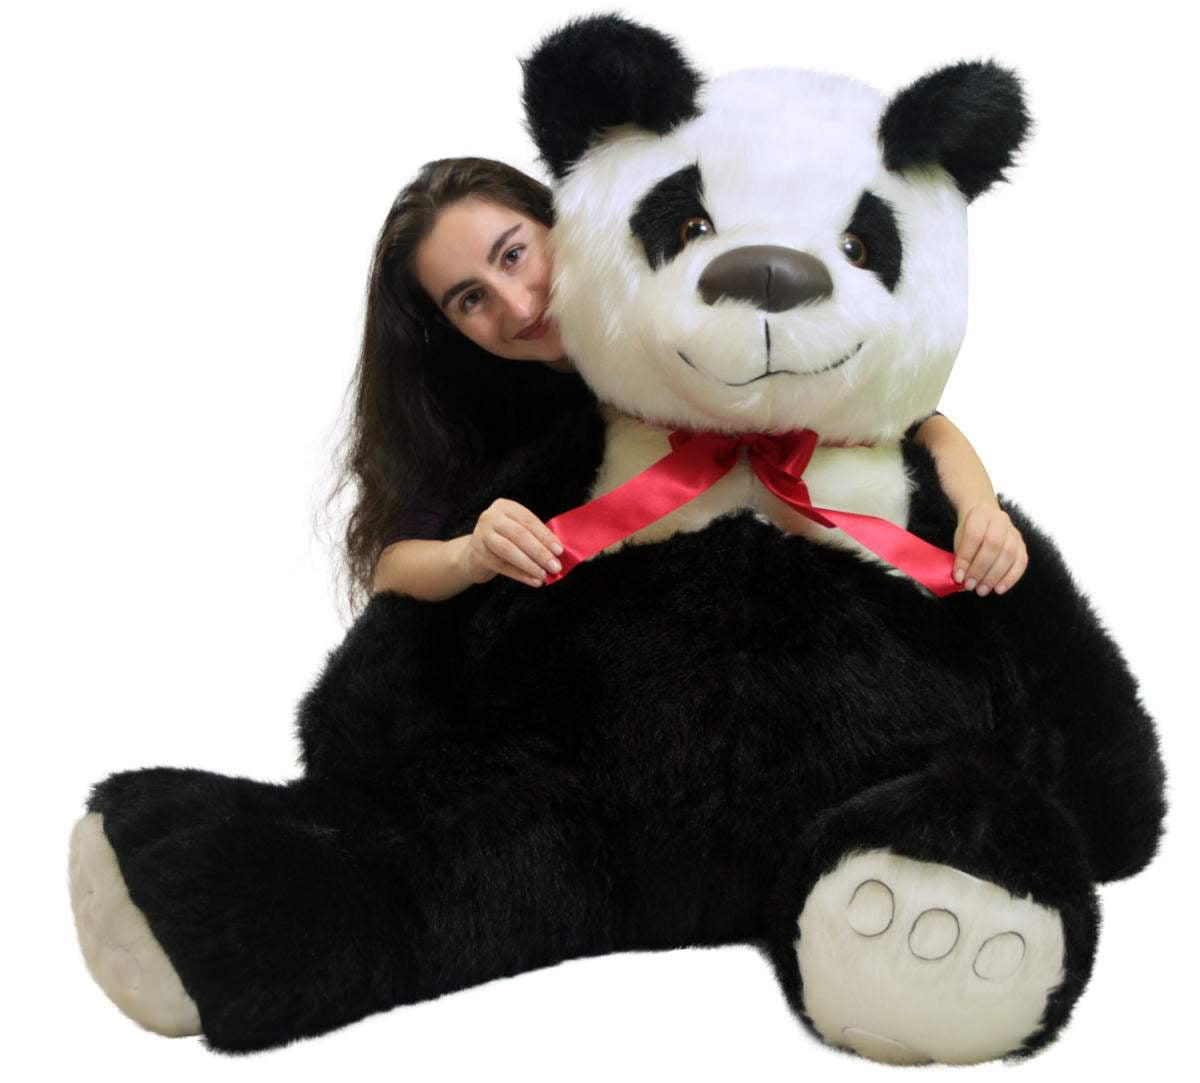 American Made Giant Stuffed Panda Bear 60 Inch Soft 5 Foot Teddybear